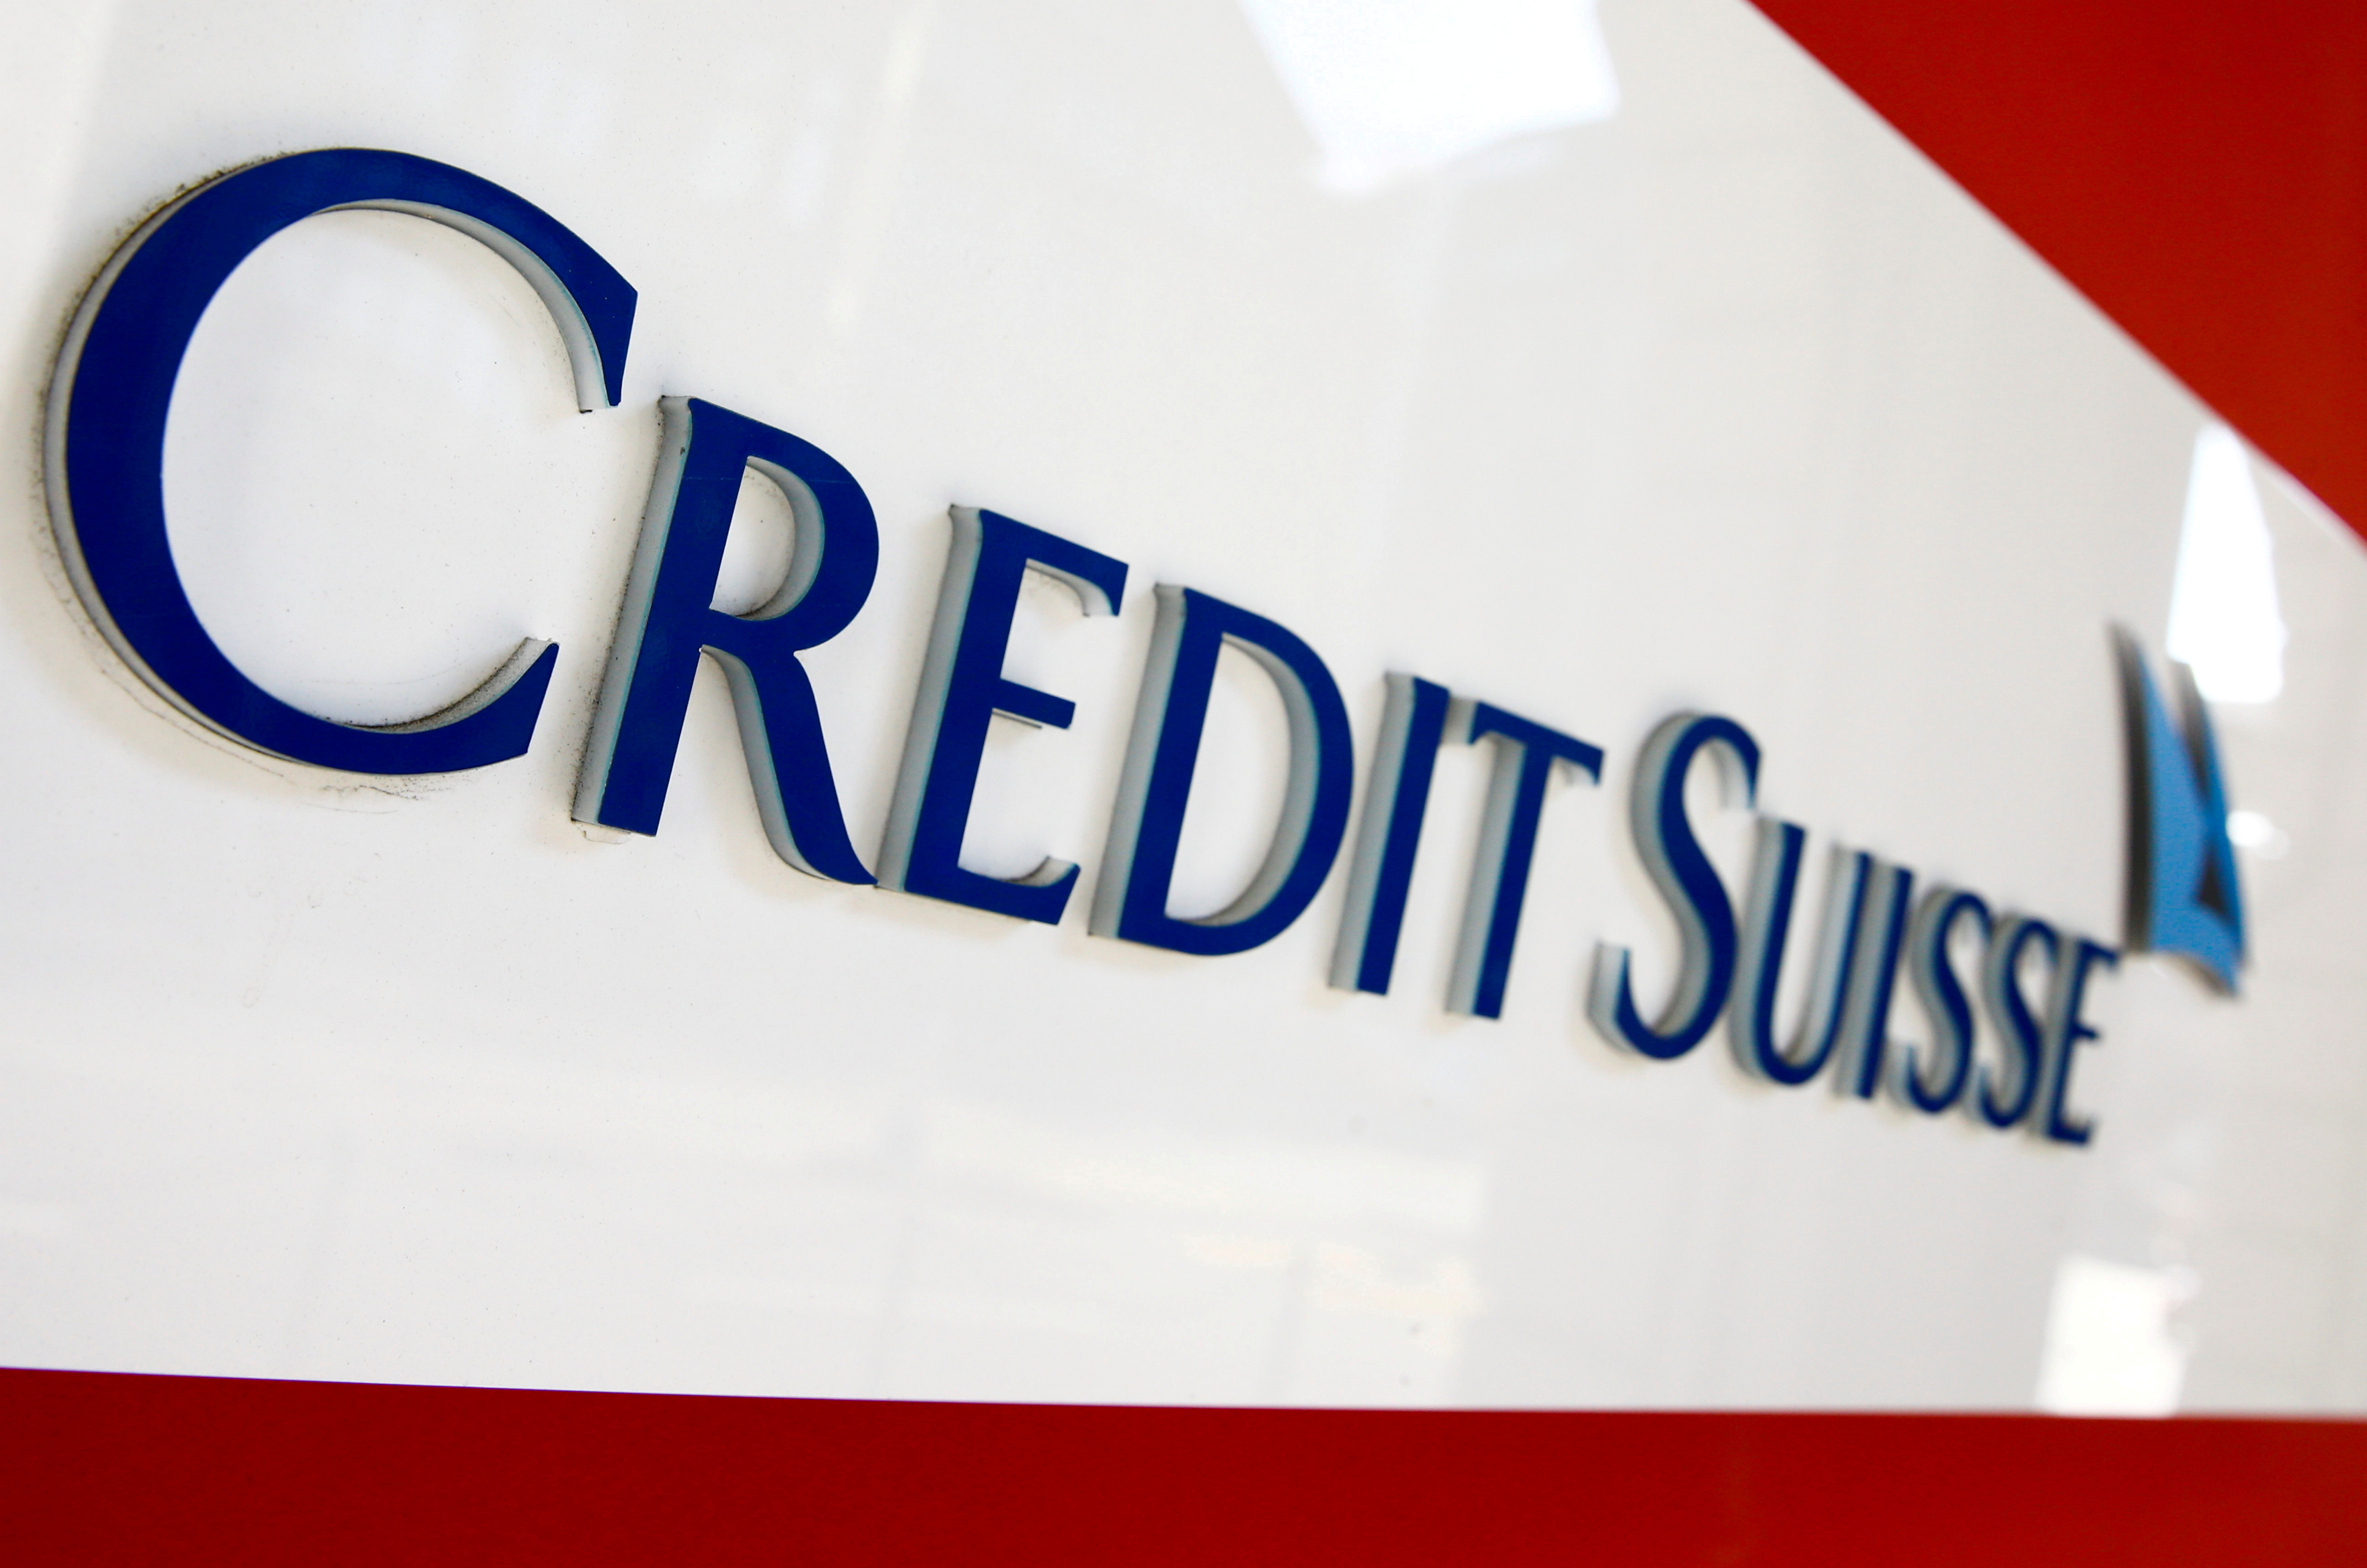 The logo of Swiss bank Credit Suisse is seen at a branch office in Zurich, Switzerland, April 14, 2021. REUTERS/Arnd Wiegmann